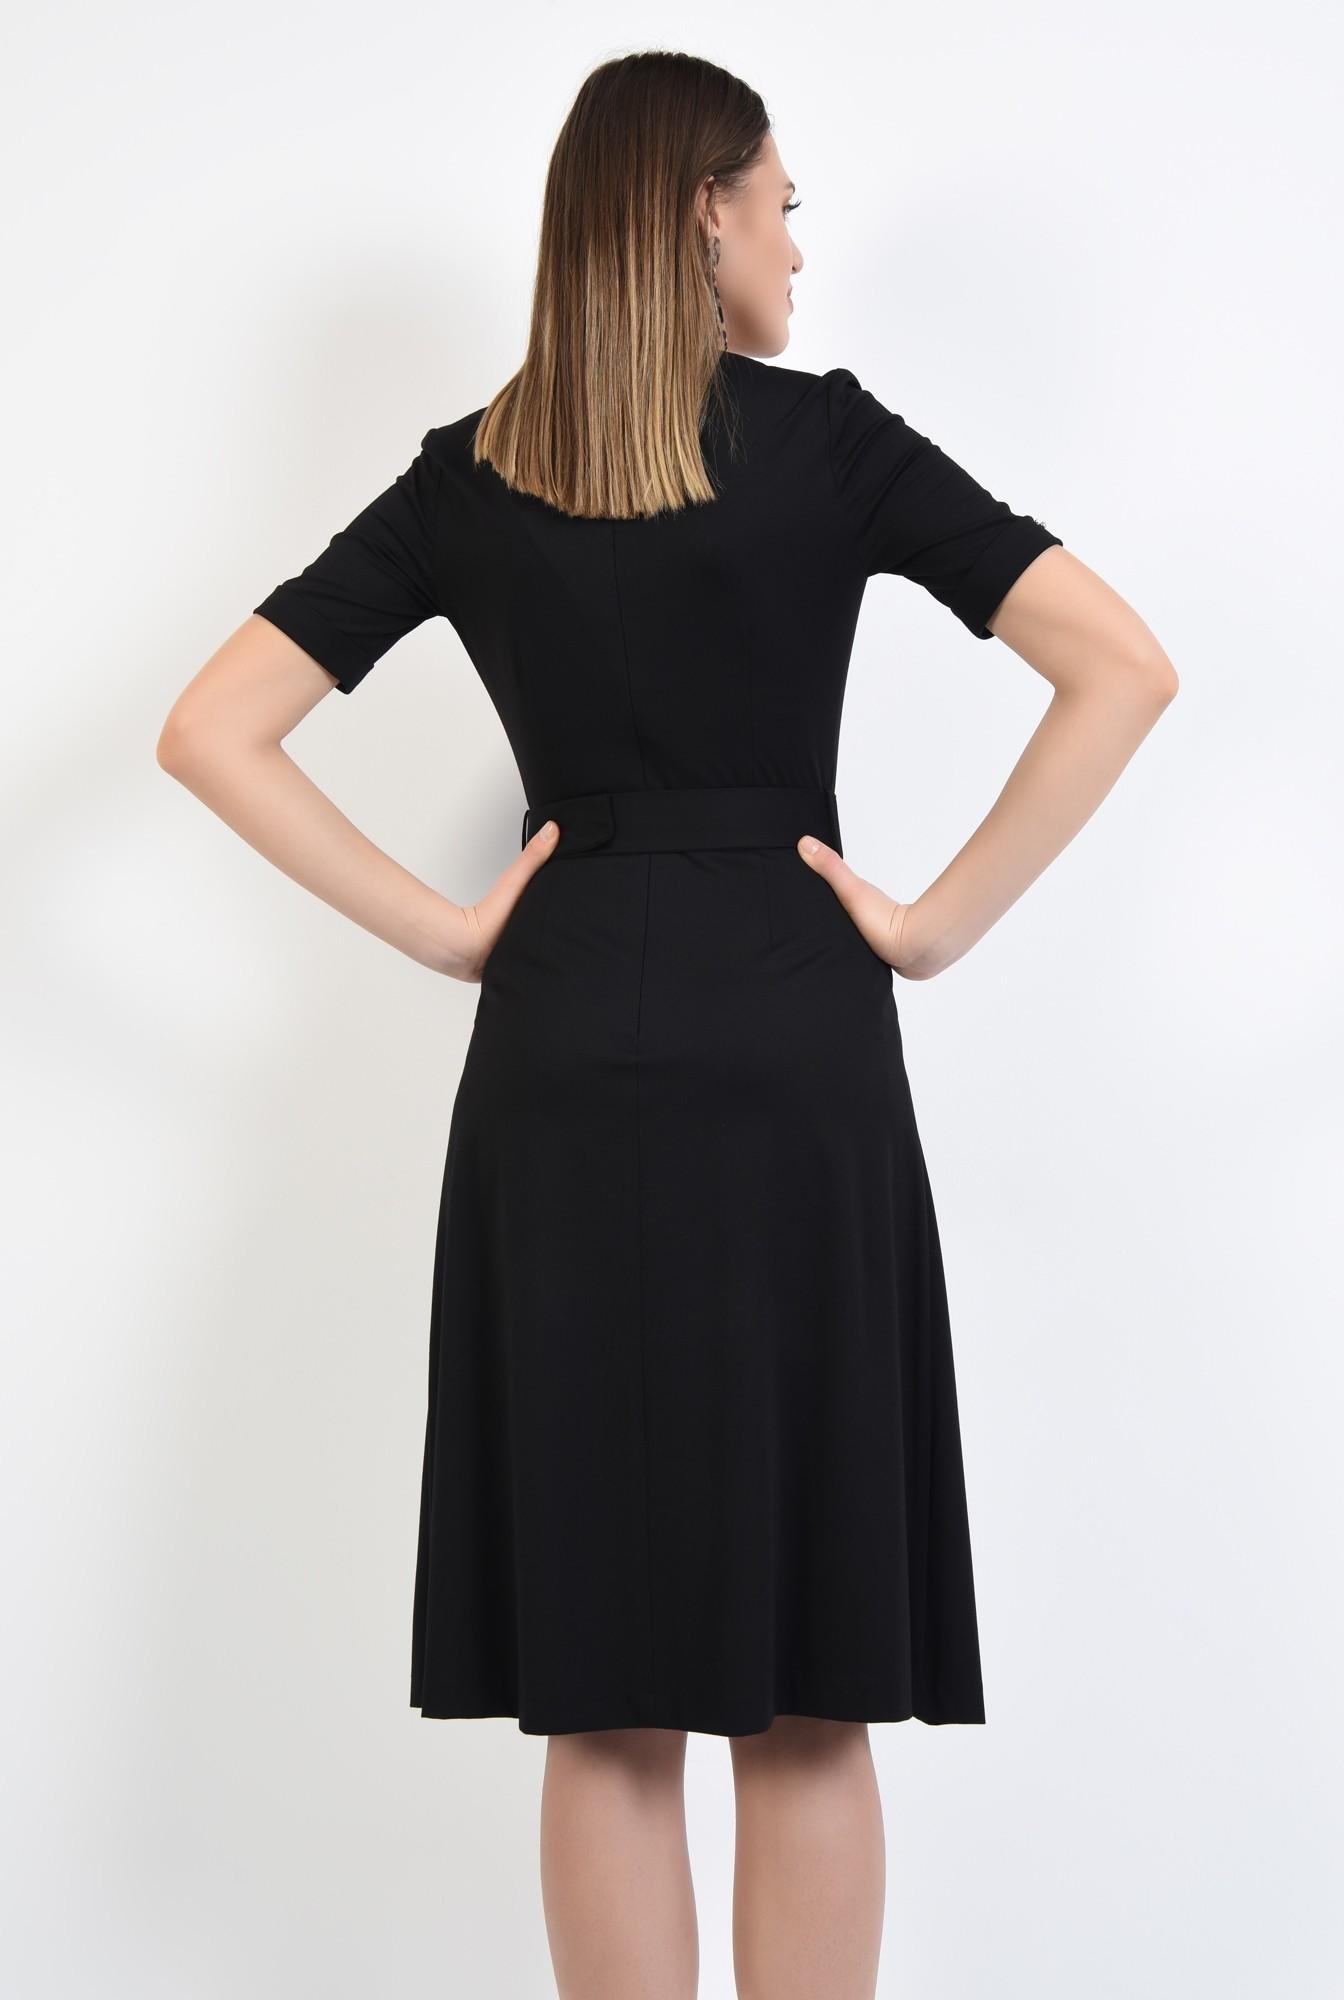 1 - 360 - rochie midi, neagra, evazata, maneci scurte cu mansete